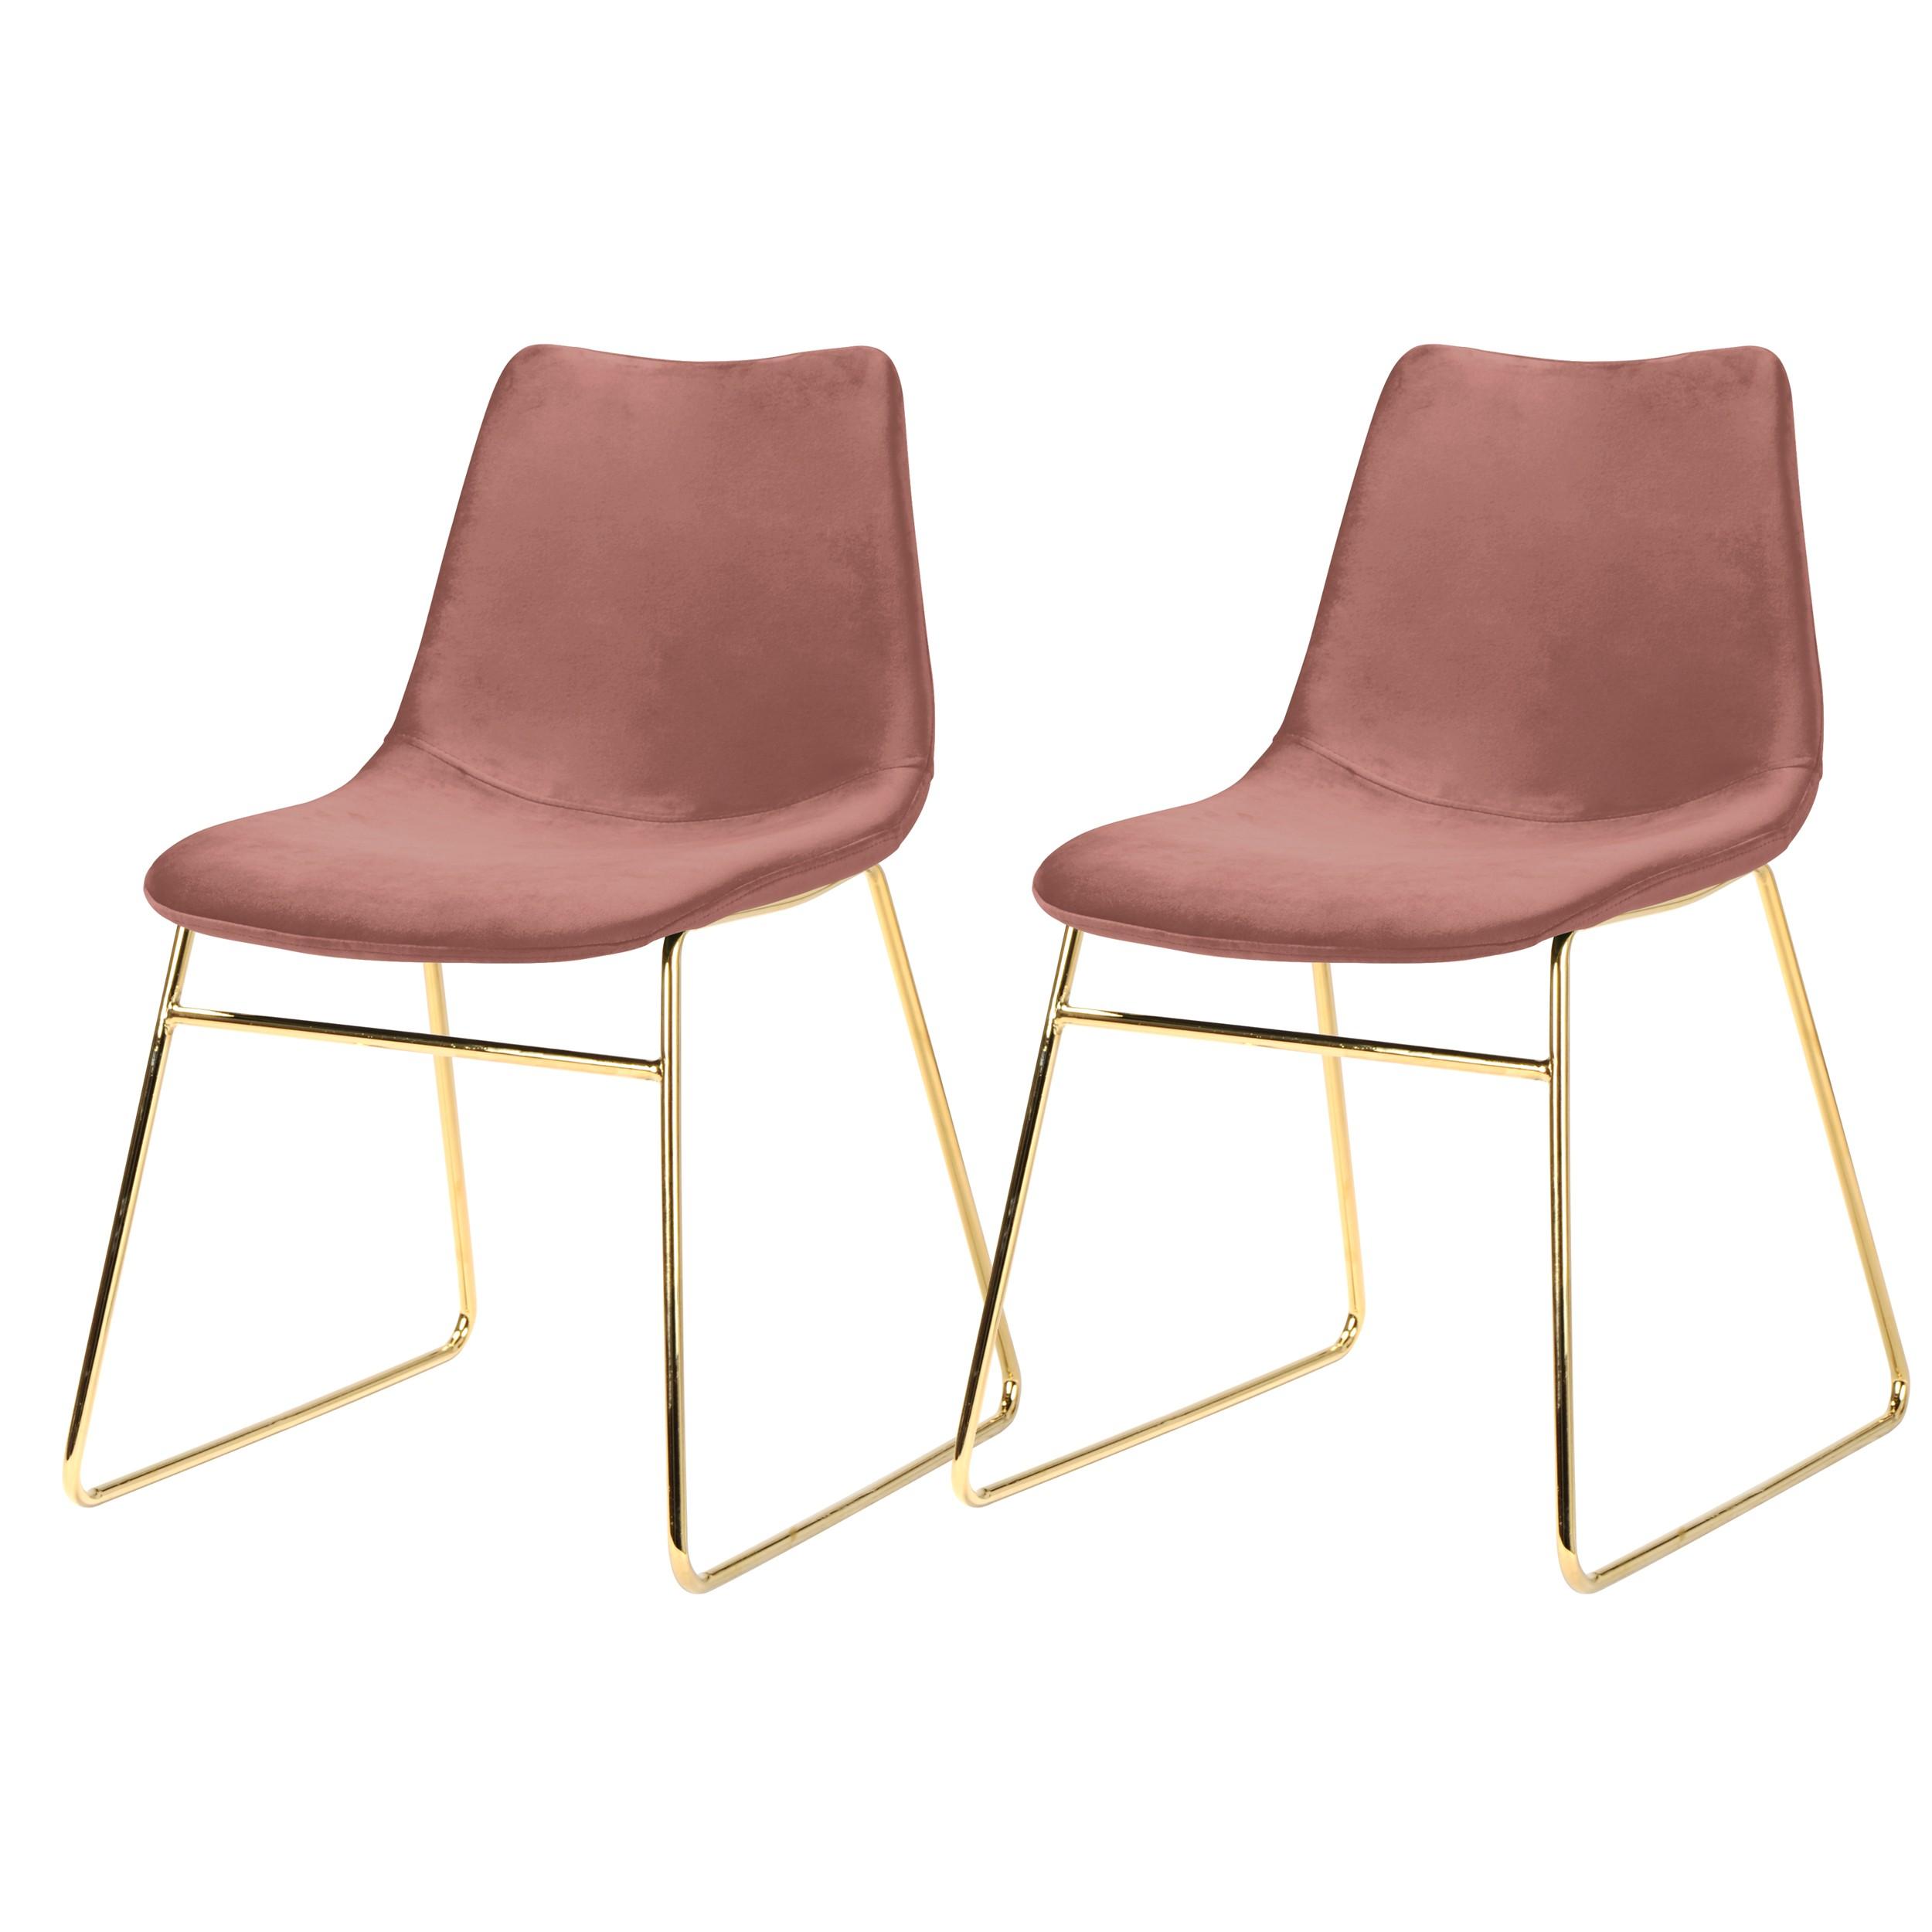 acheter-chaise-velours-rose-pieds-traineaux